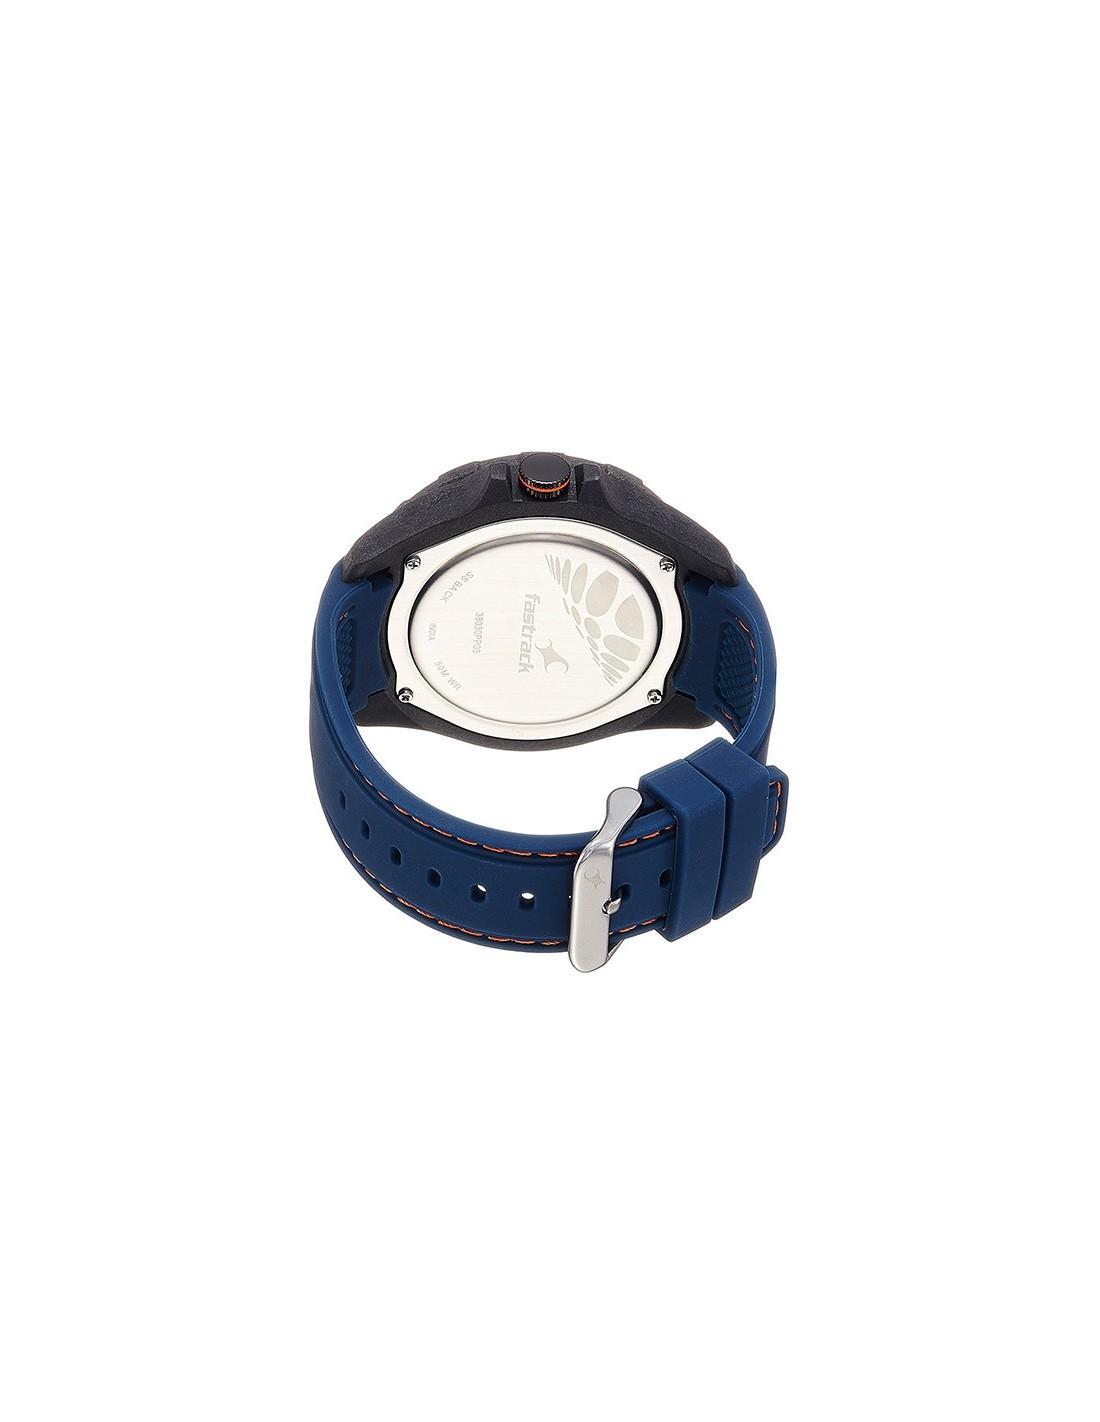 buy calvin klein k3v235l6 womens at lowest price